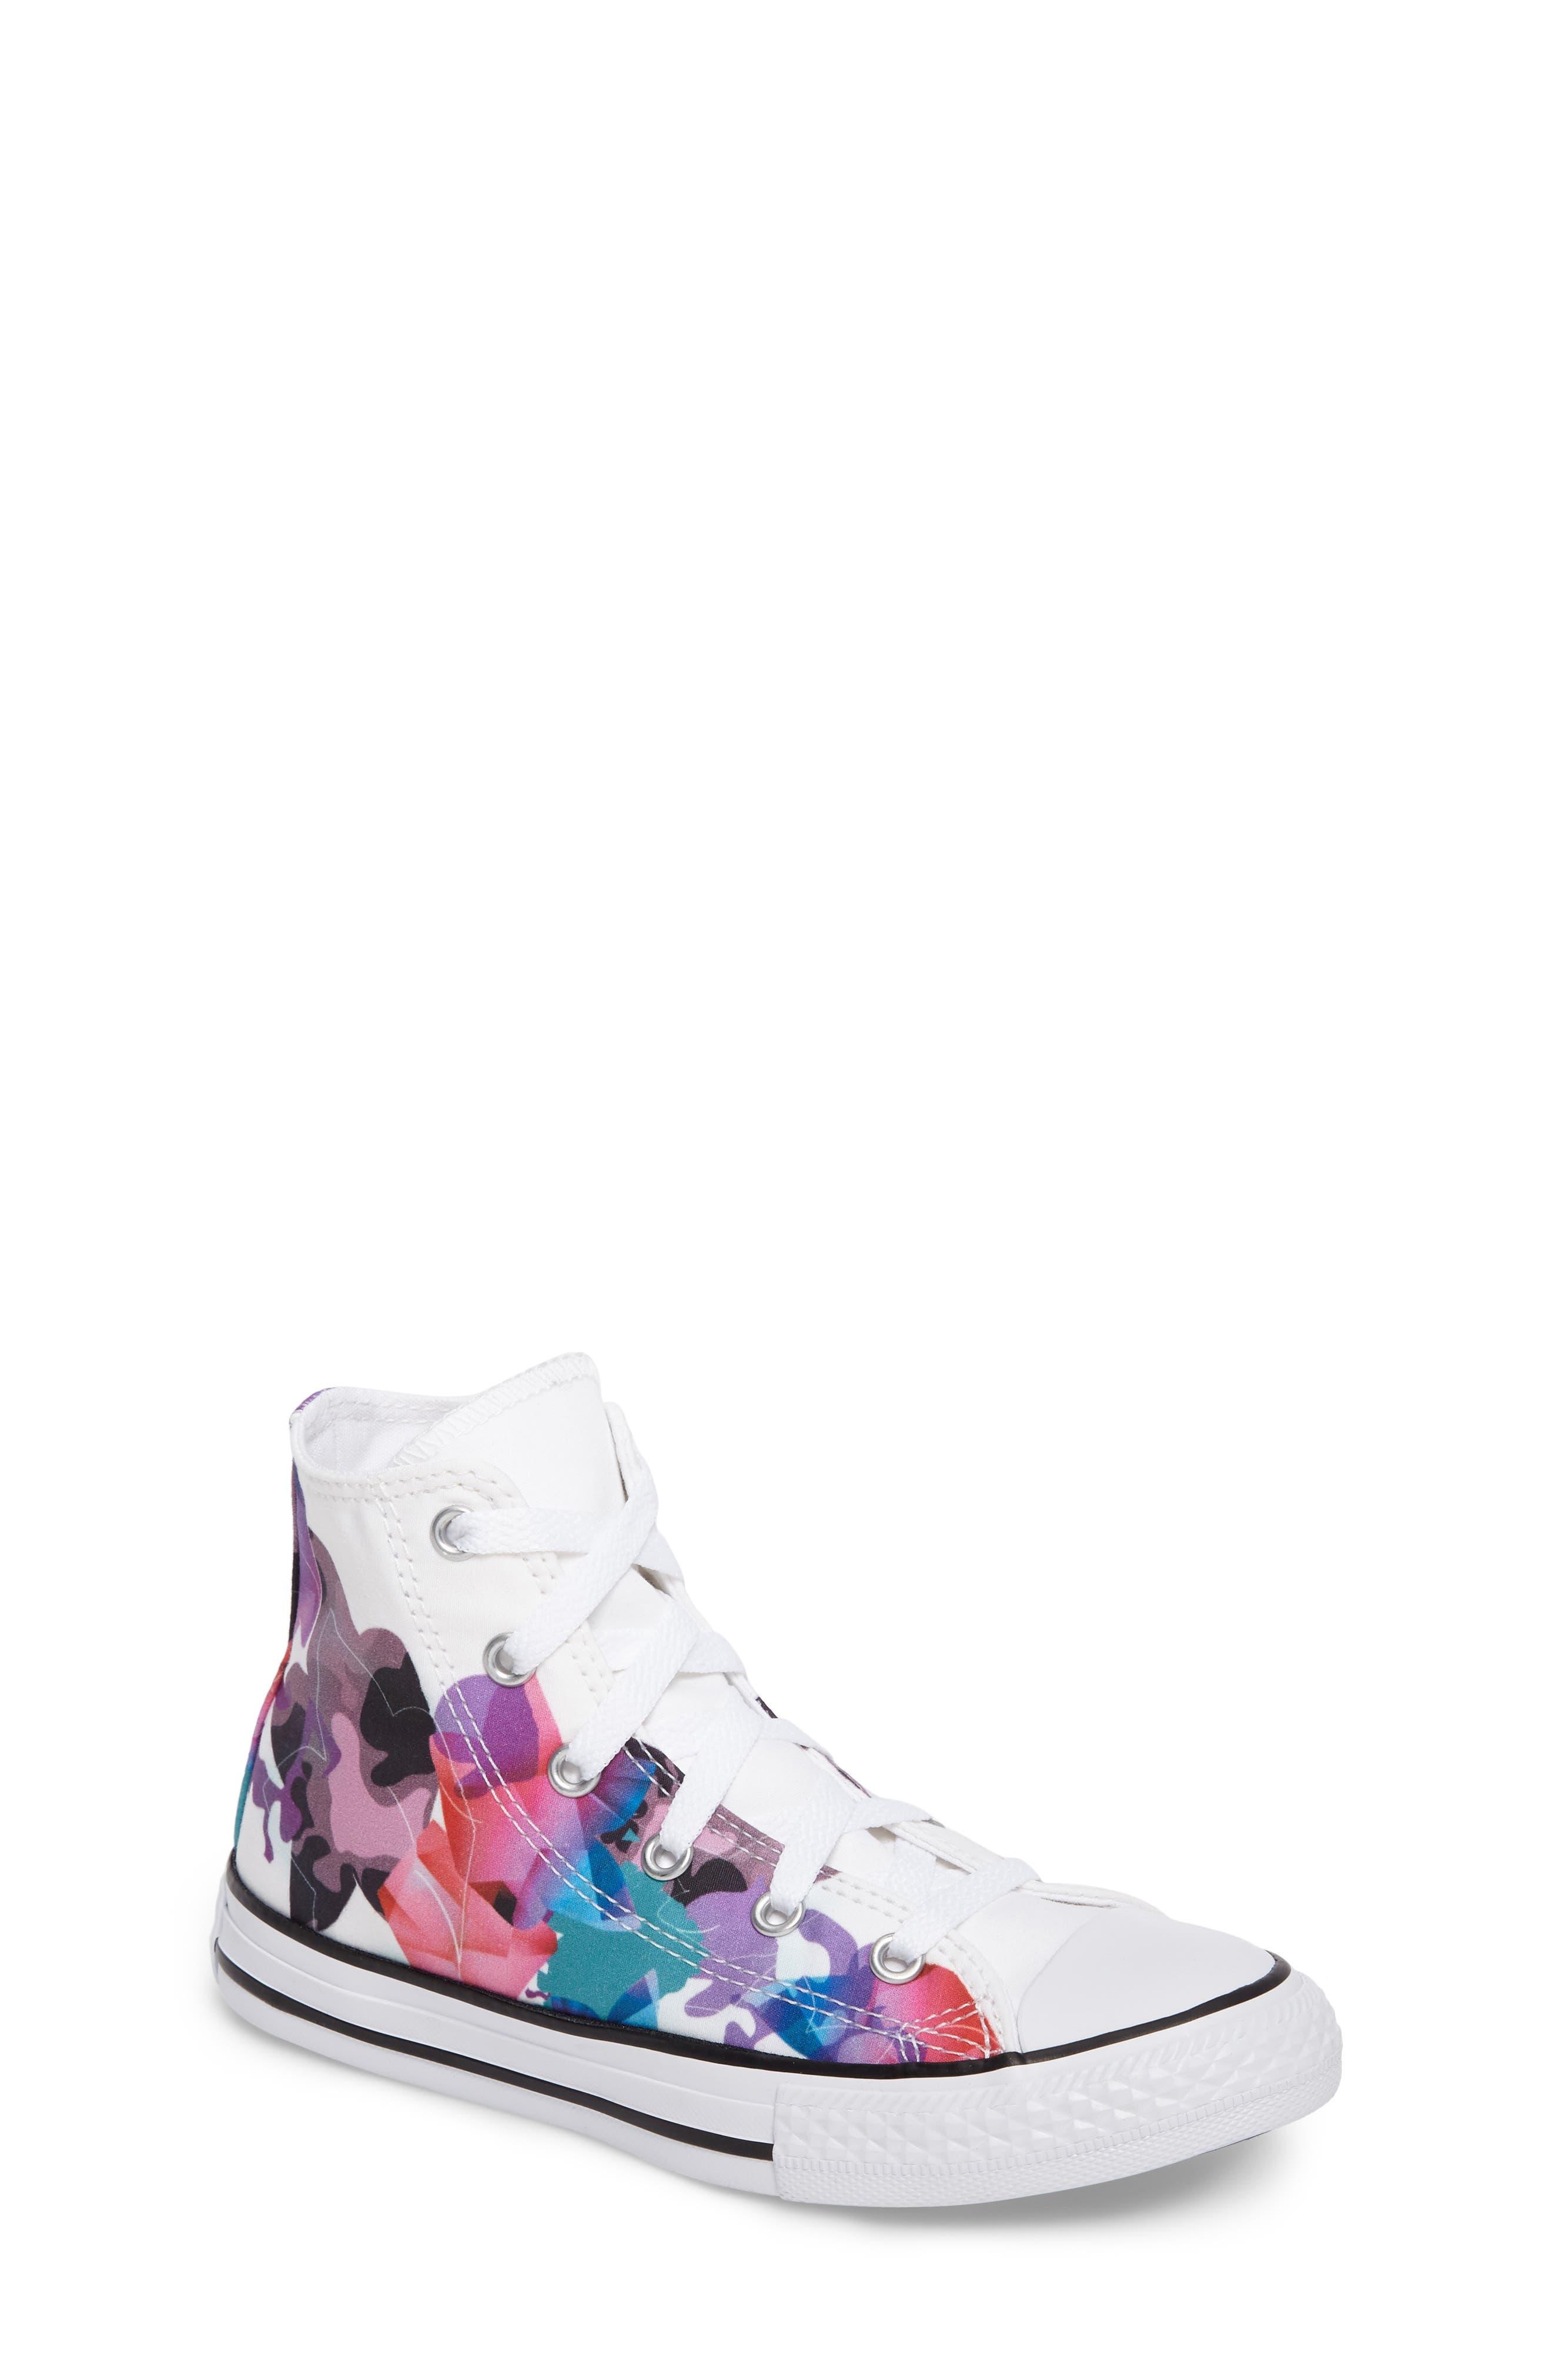 Converse Chuck Taylor® All Star® Print High Top Sneaker (Toddler, Little Kid & Big Kid)